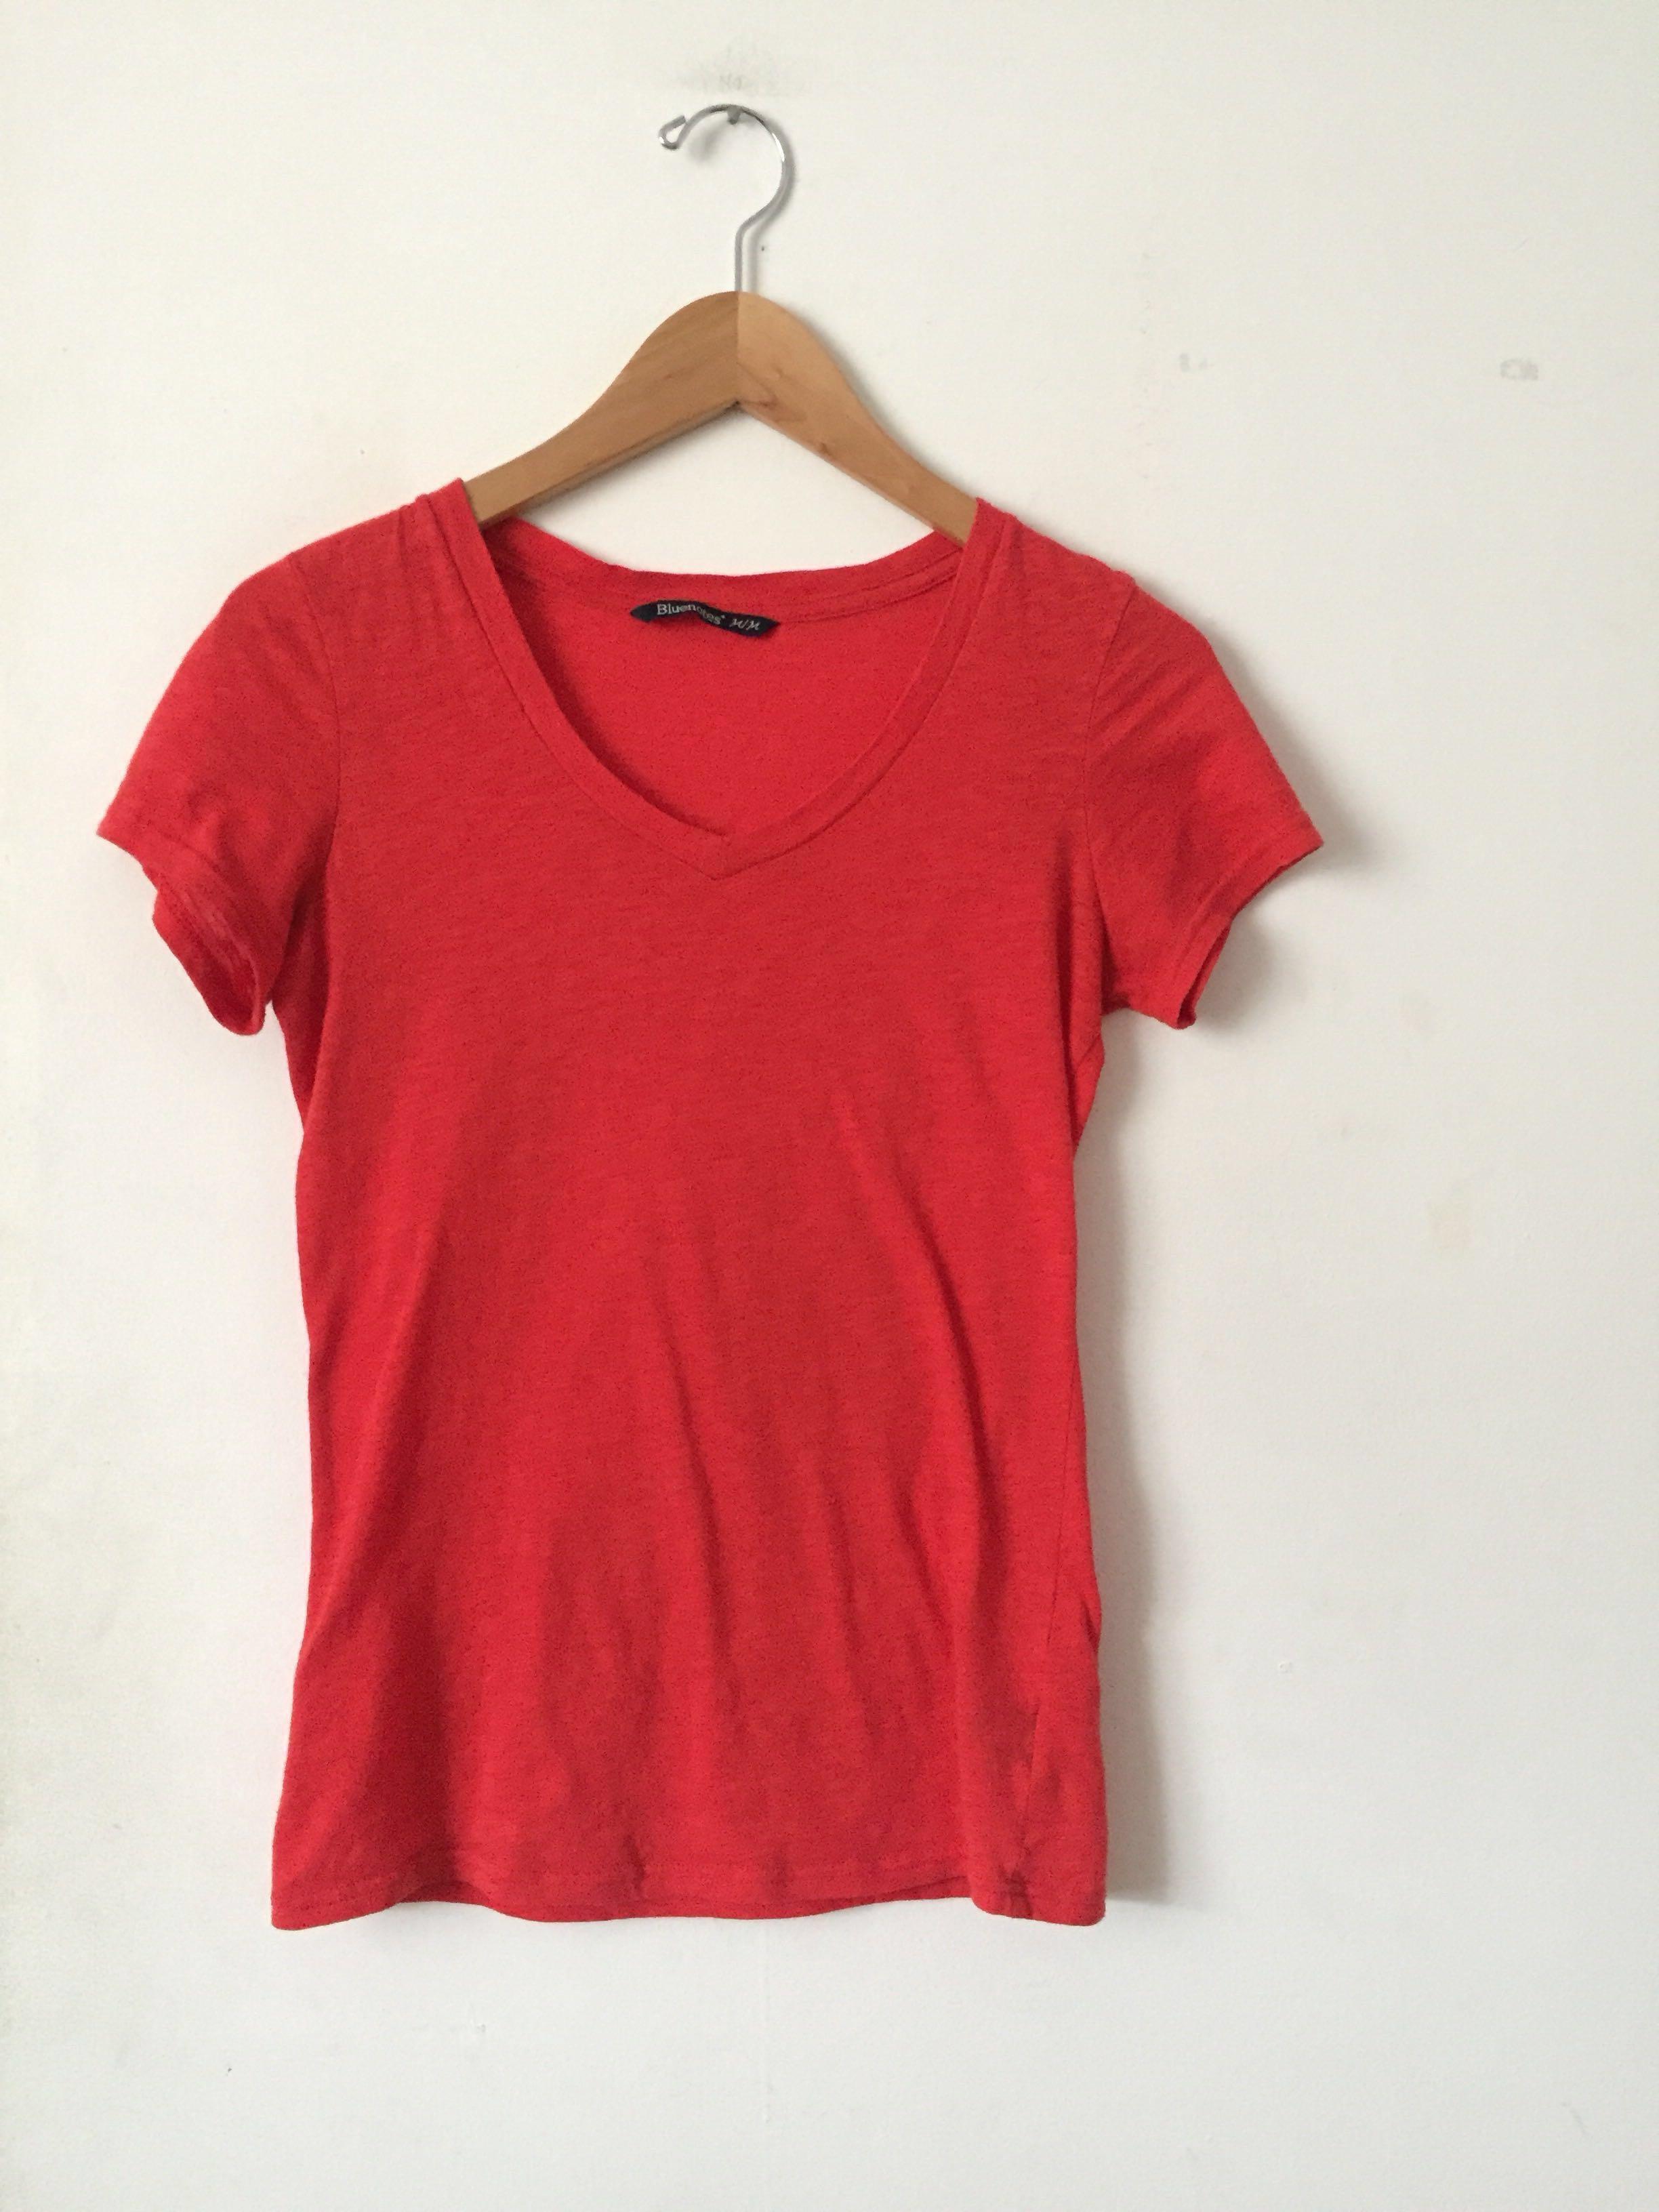 Red Bluenotes Shirt